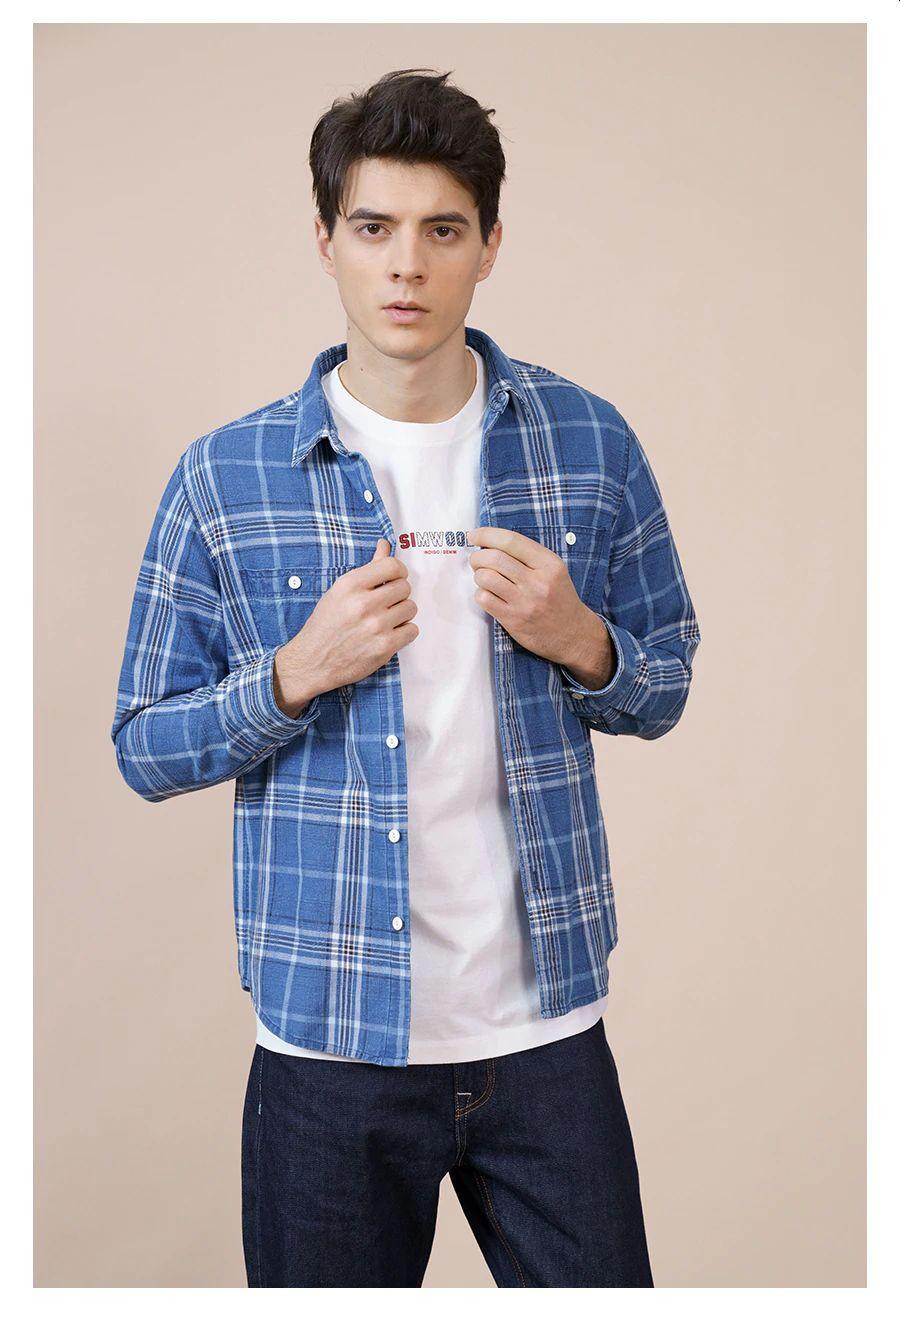 Cotton Denim Check Shirt Plus Size Brand Clothing